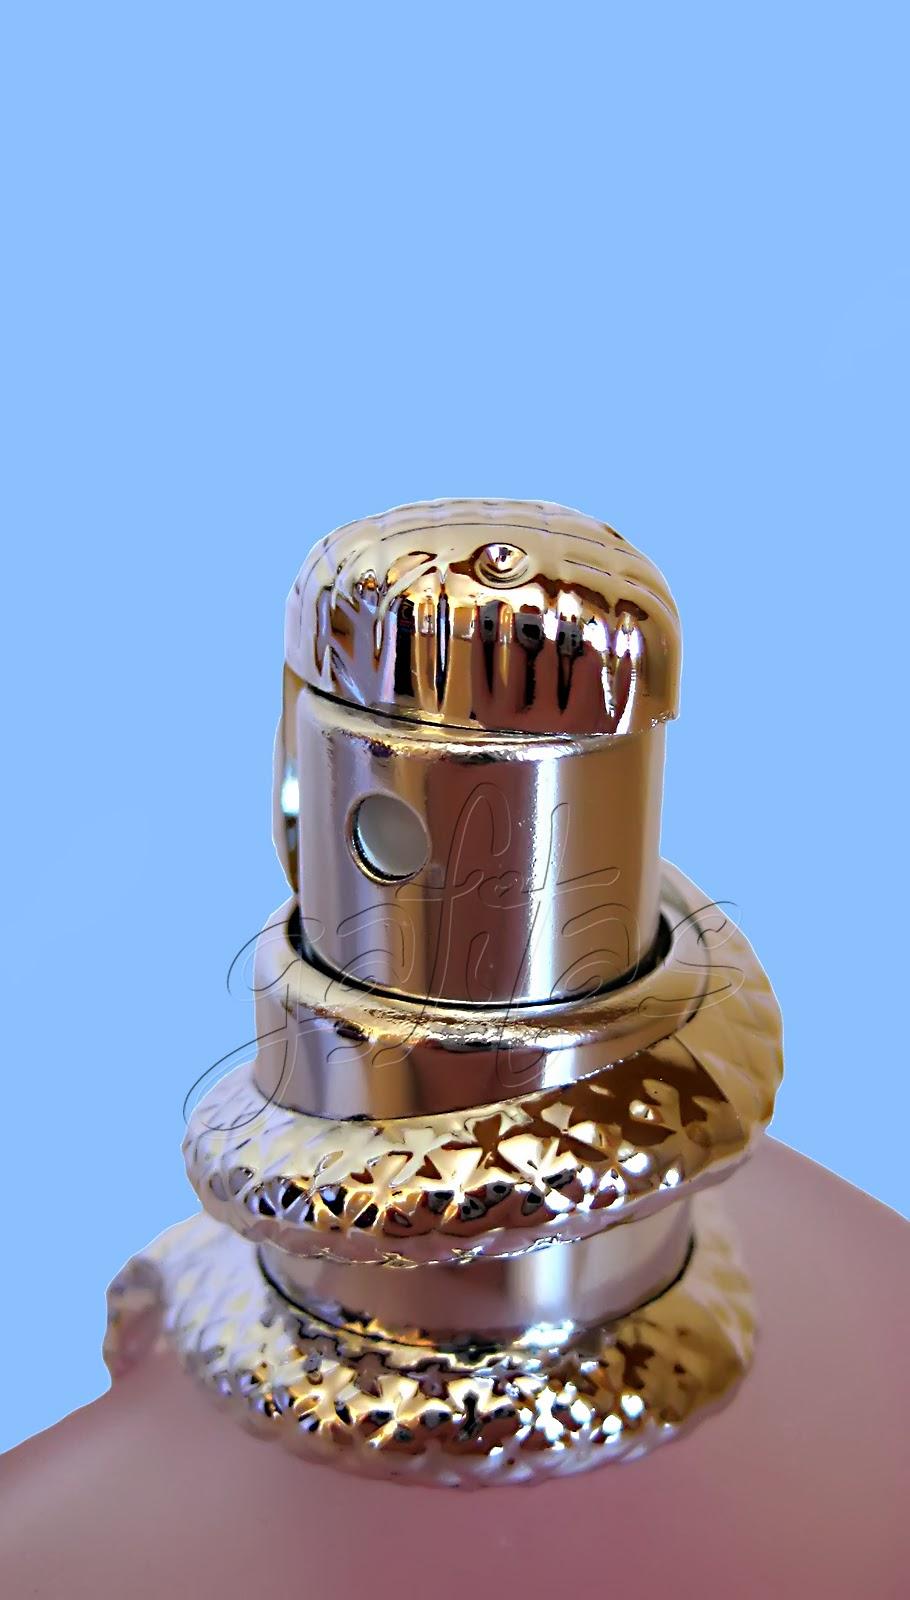 Gafitas jeanne arthes navidad 2013 for Ada jardin perfume